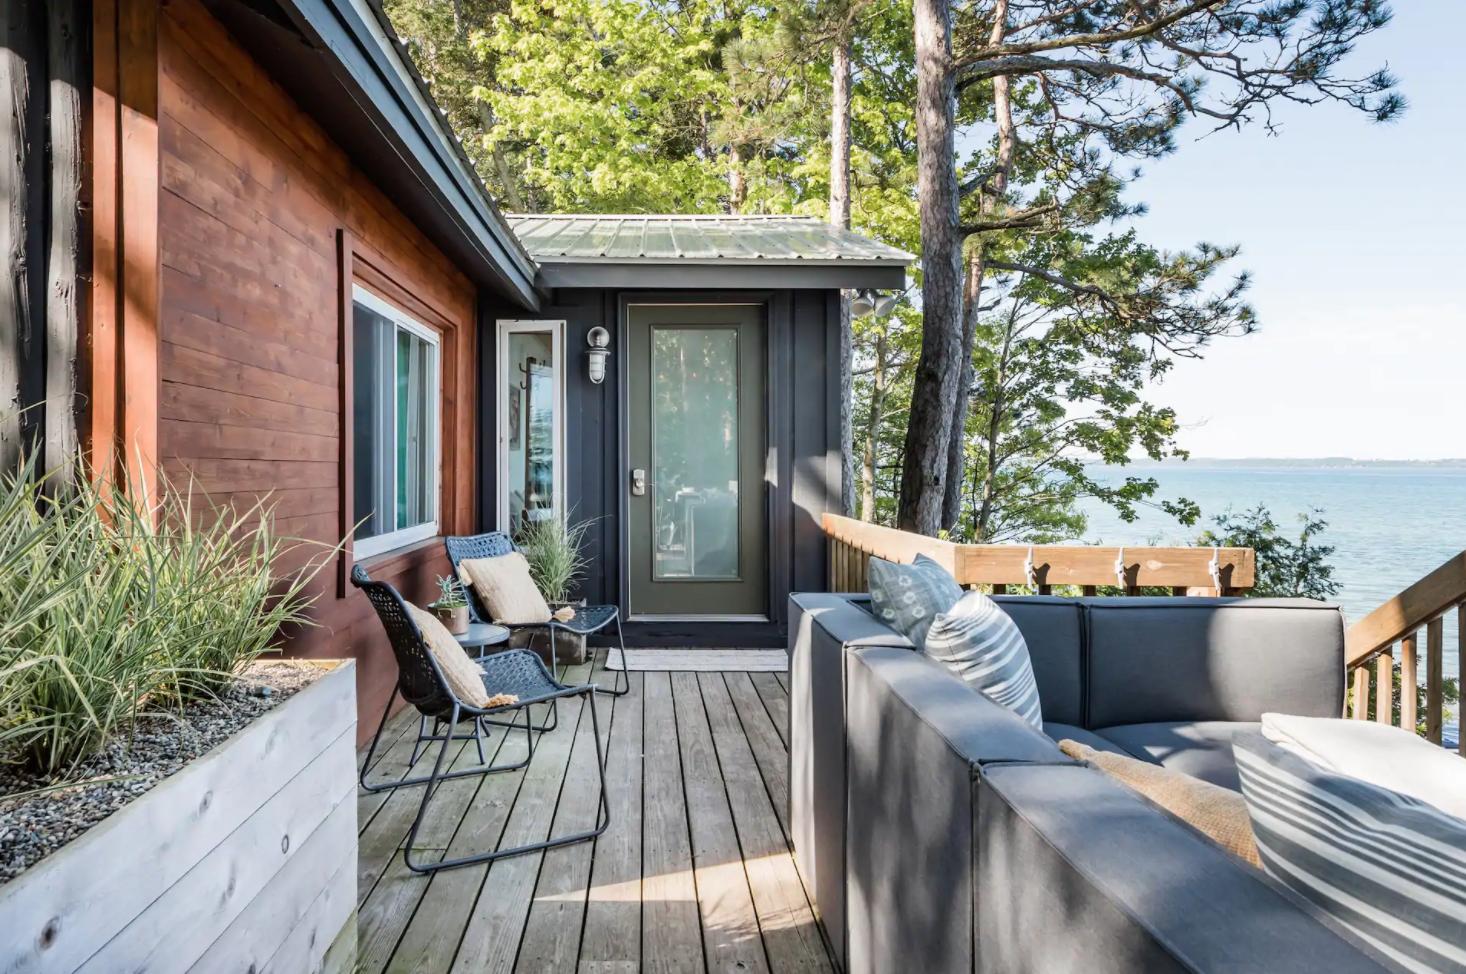 Lake Michigan Airbnb